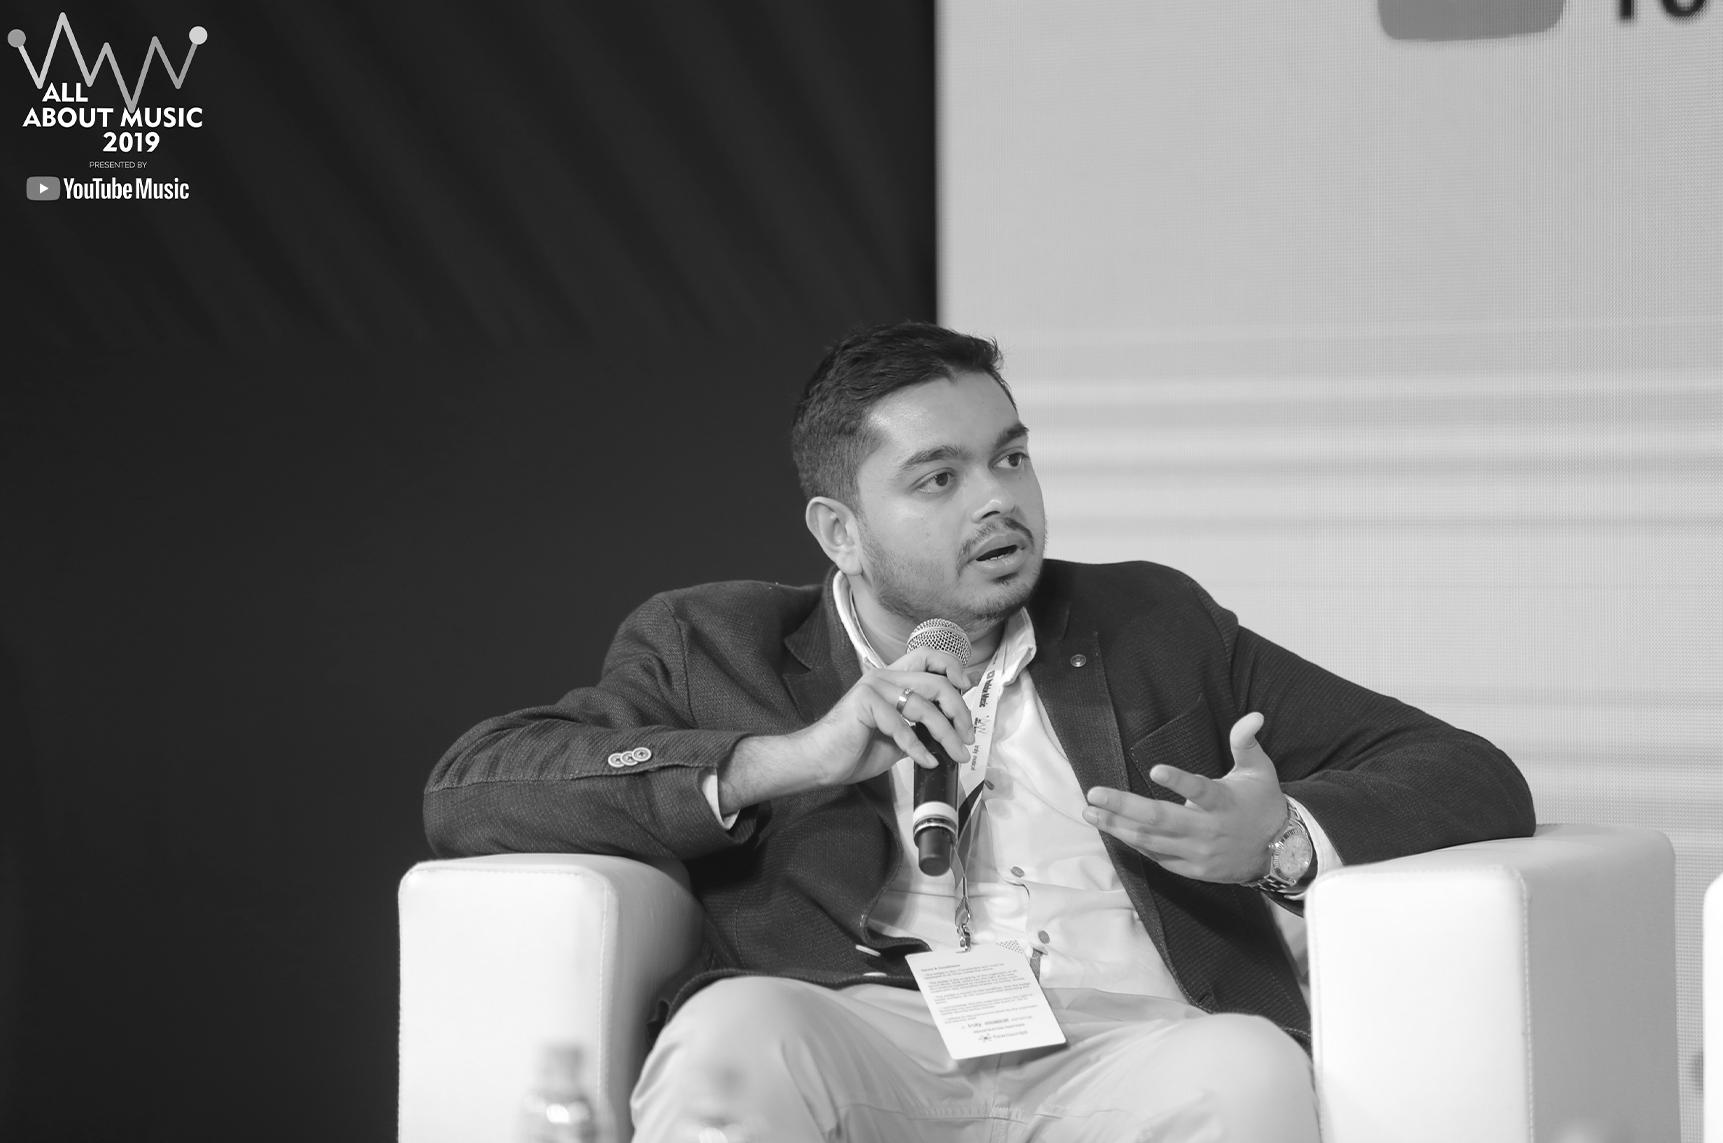 Saheer Munir - Founder & Director, DIVO, All about Music Virtual Edition 2020 Speaker